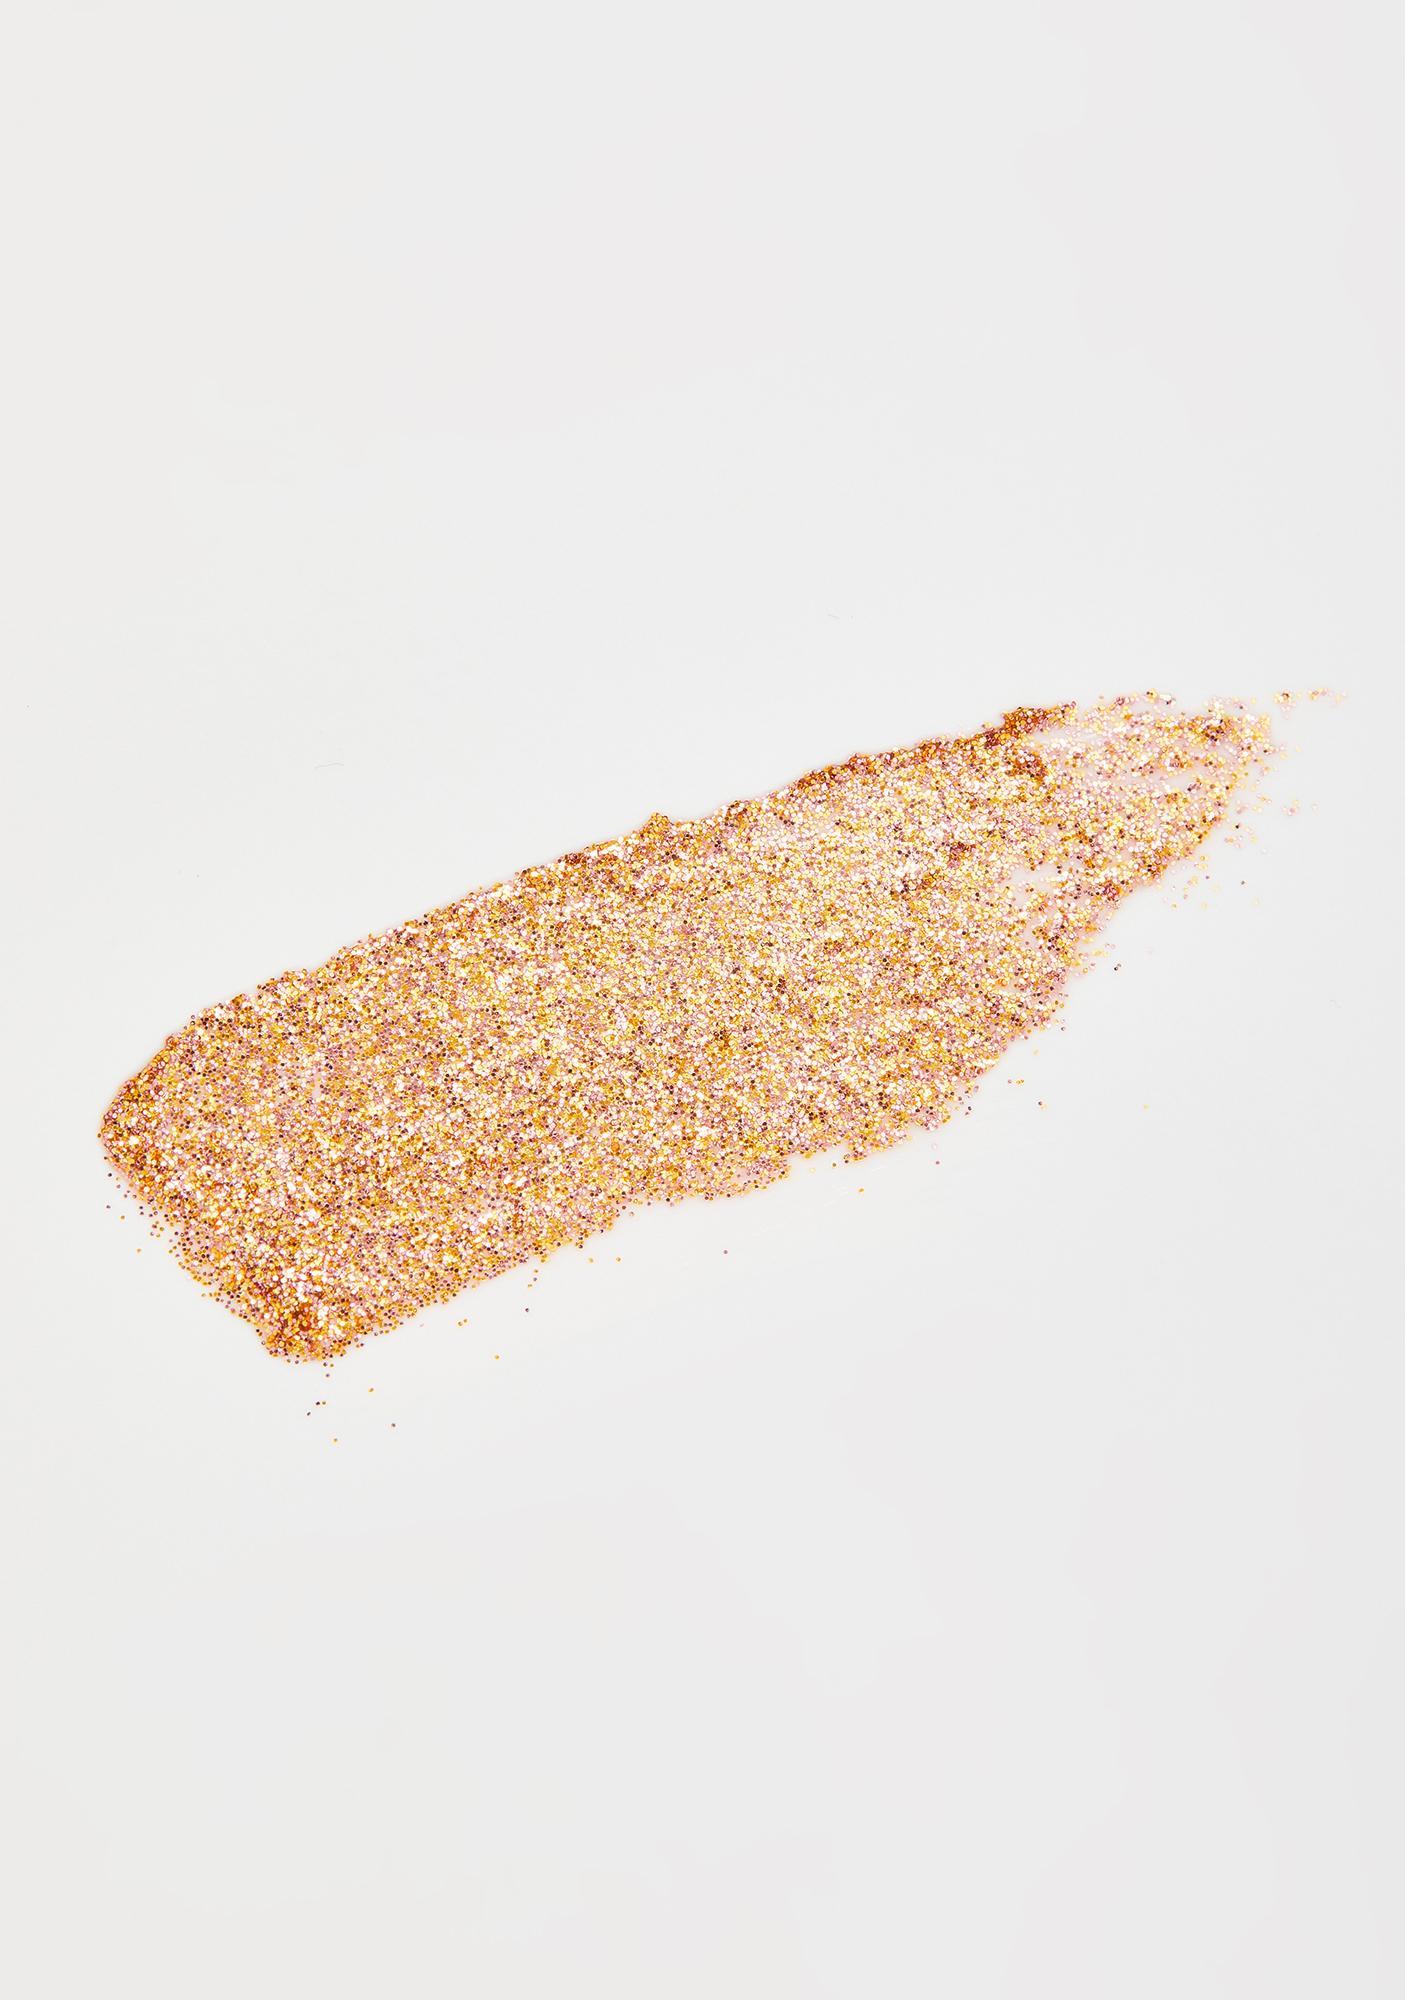 Shrine Copper Glitter Lids Liquid Eyeshadow